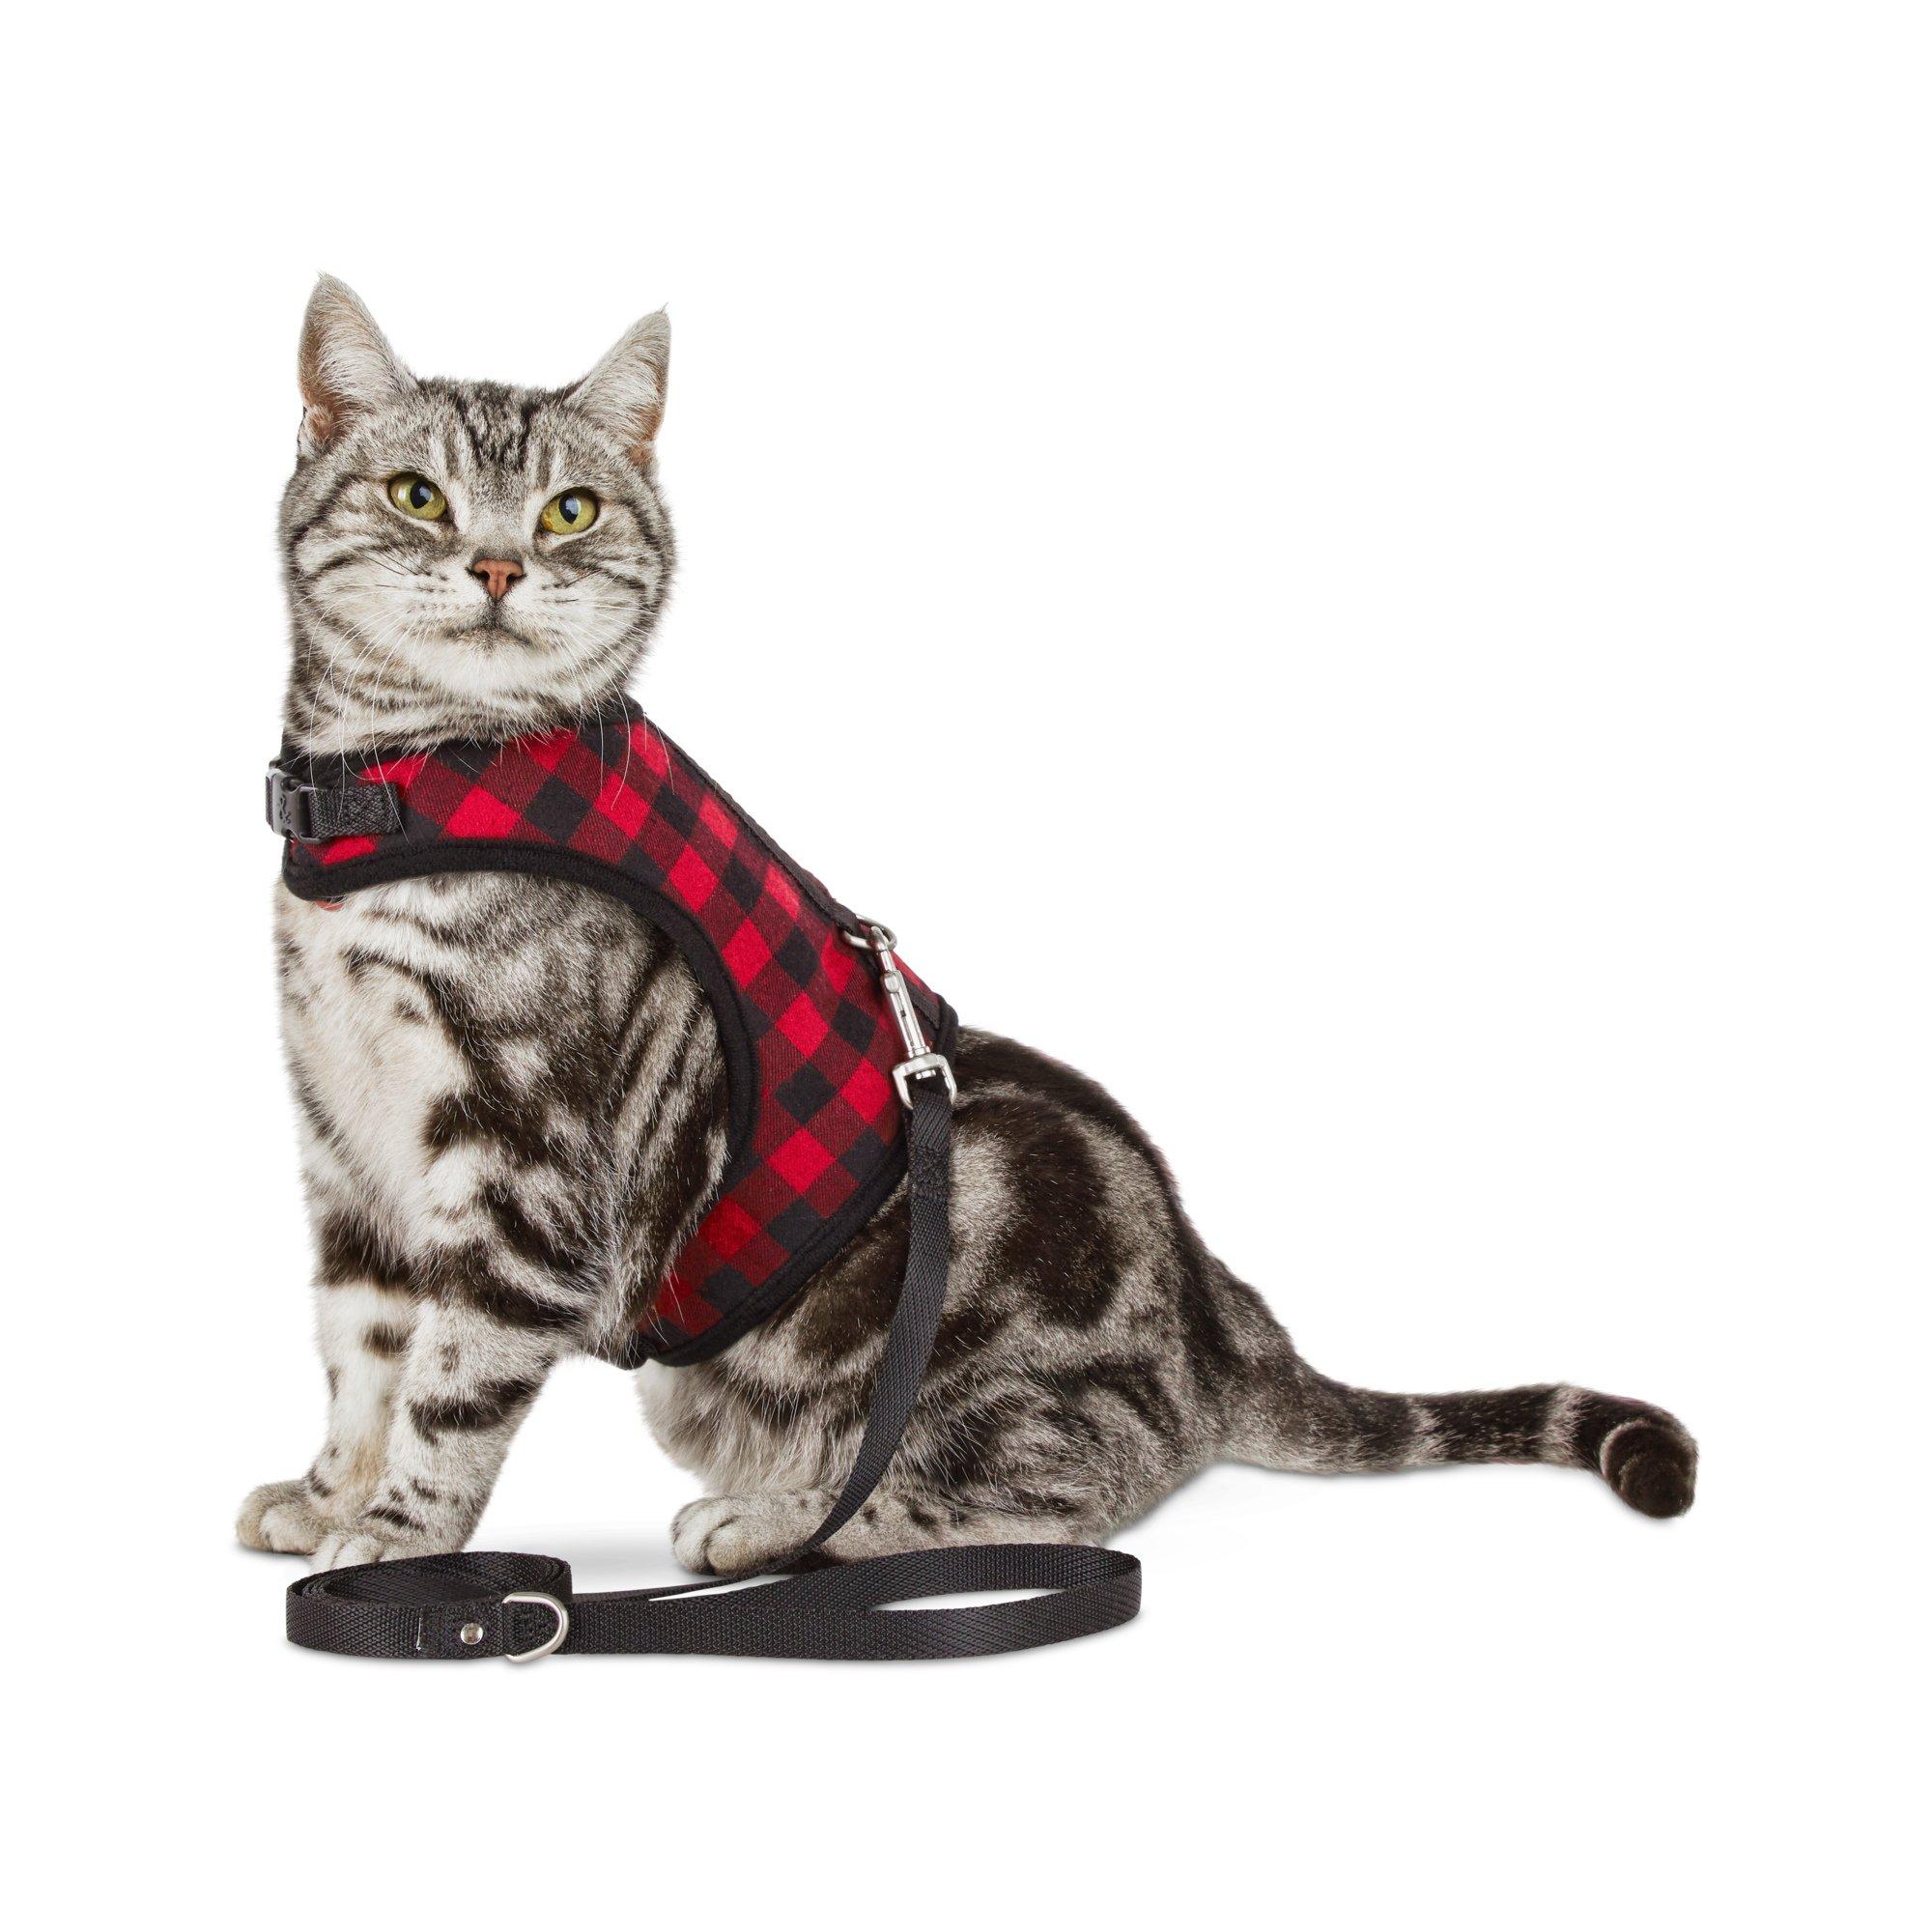 Bond & Co. Buffalo-Check Cat Harness and Leash Set | Petco